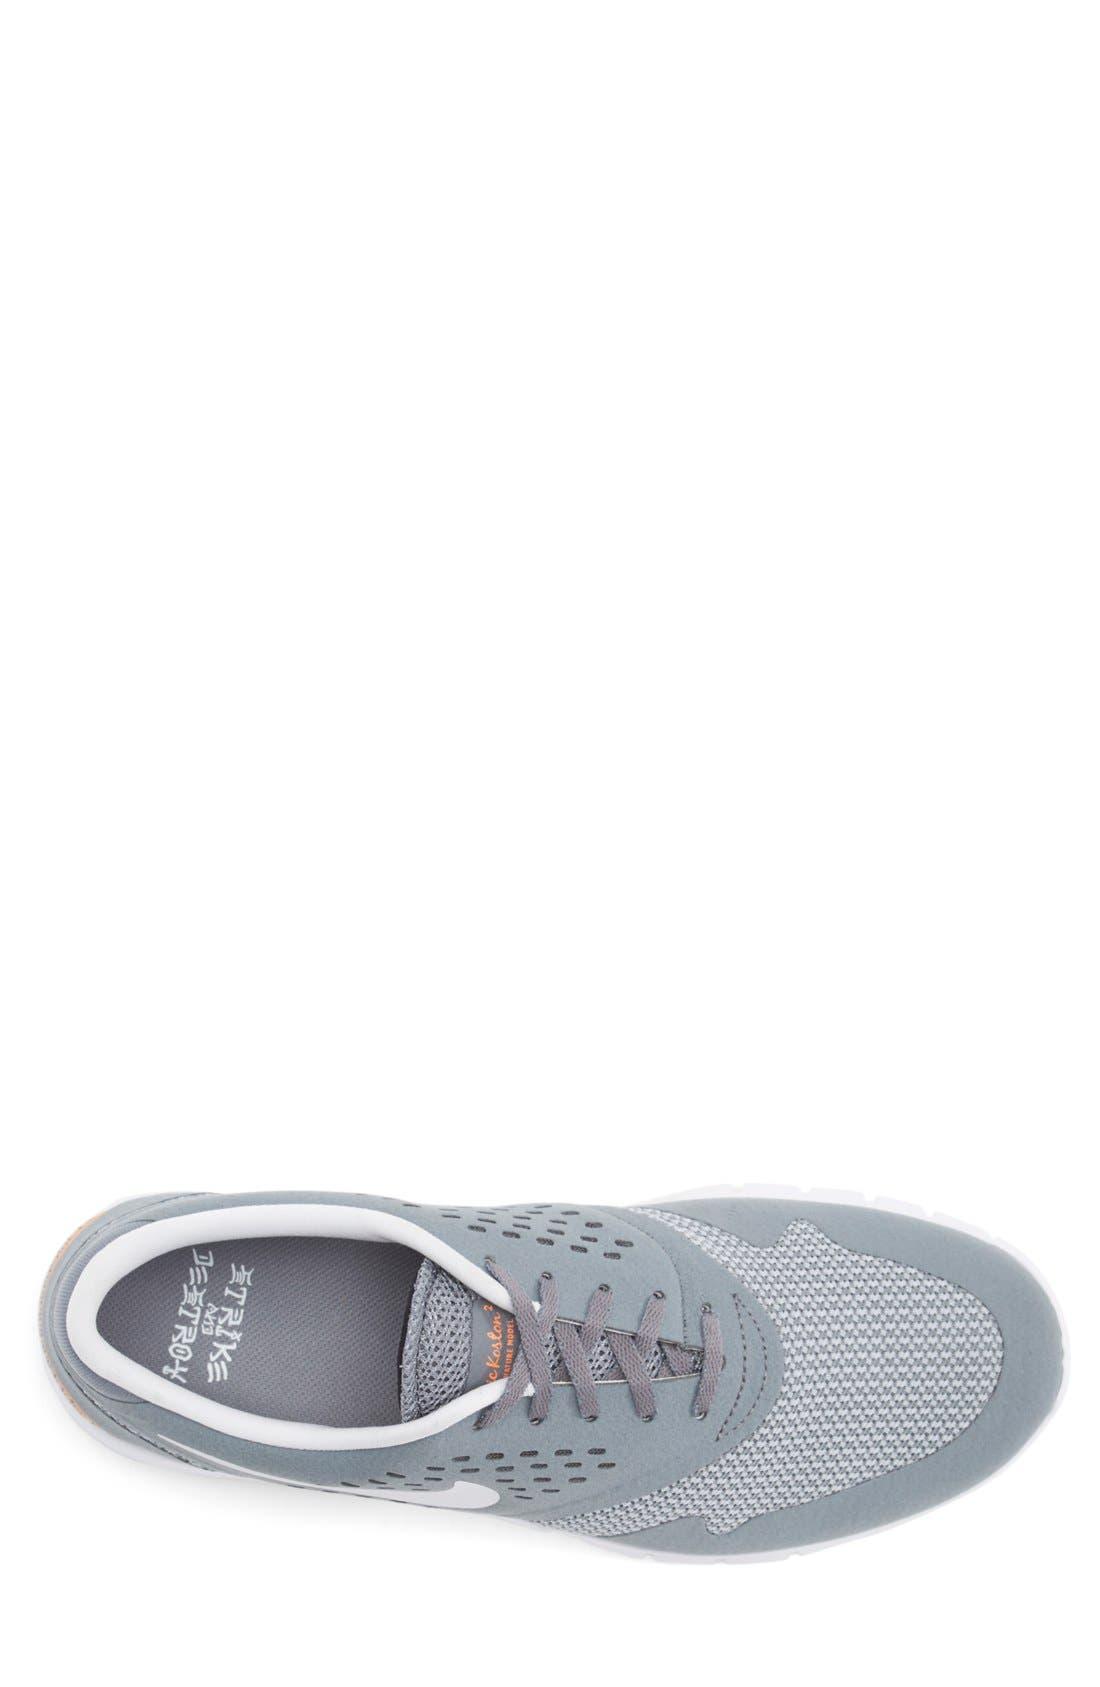 'Eric Koston 2 Max' Skate Sneaker,                             Alternate thumbnail 2, color,                             088